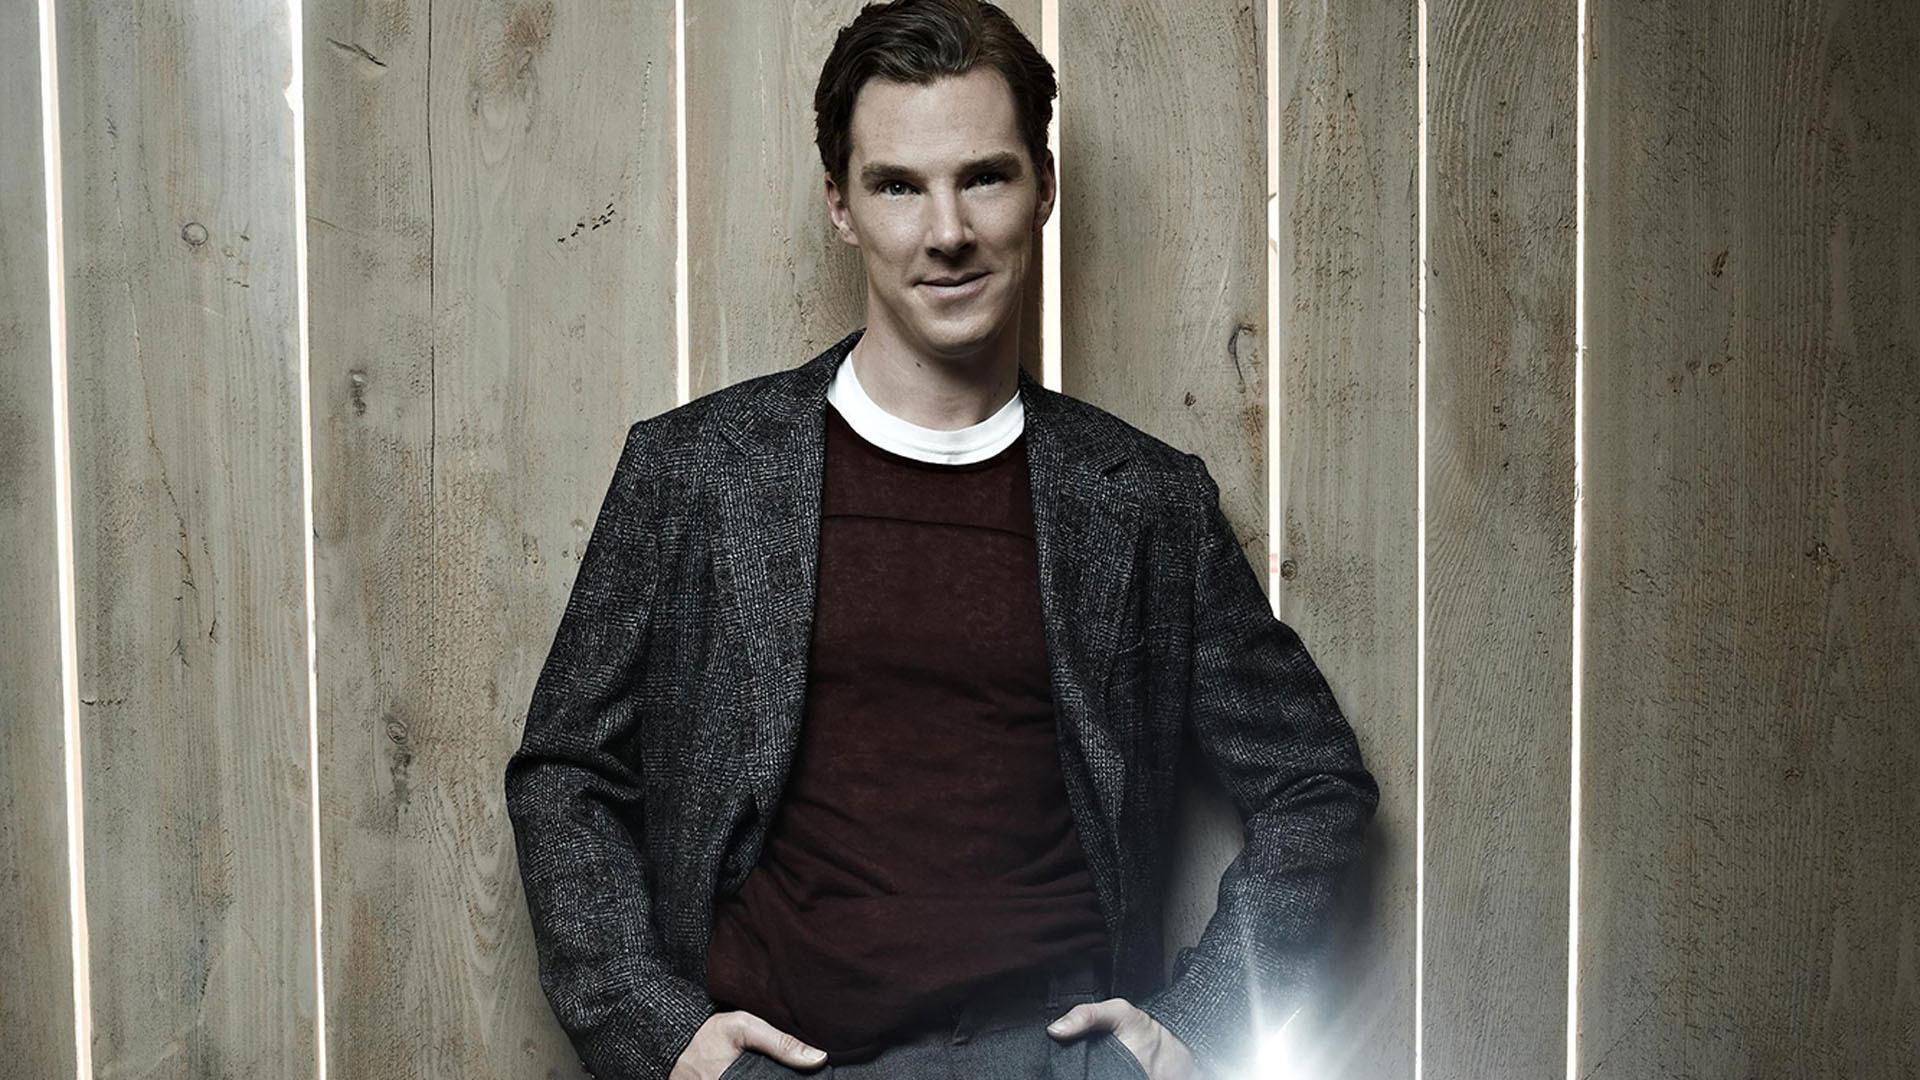 Benedict Cumberbatch Wallpaper Hd: Benedict Cumberbatch Wallpapers Images Photos Pictures